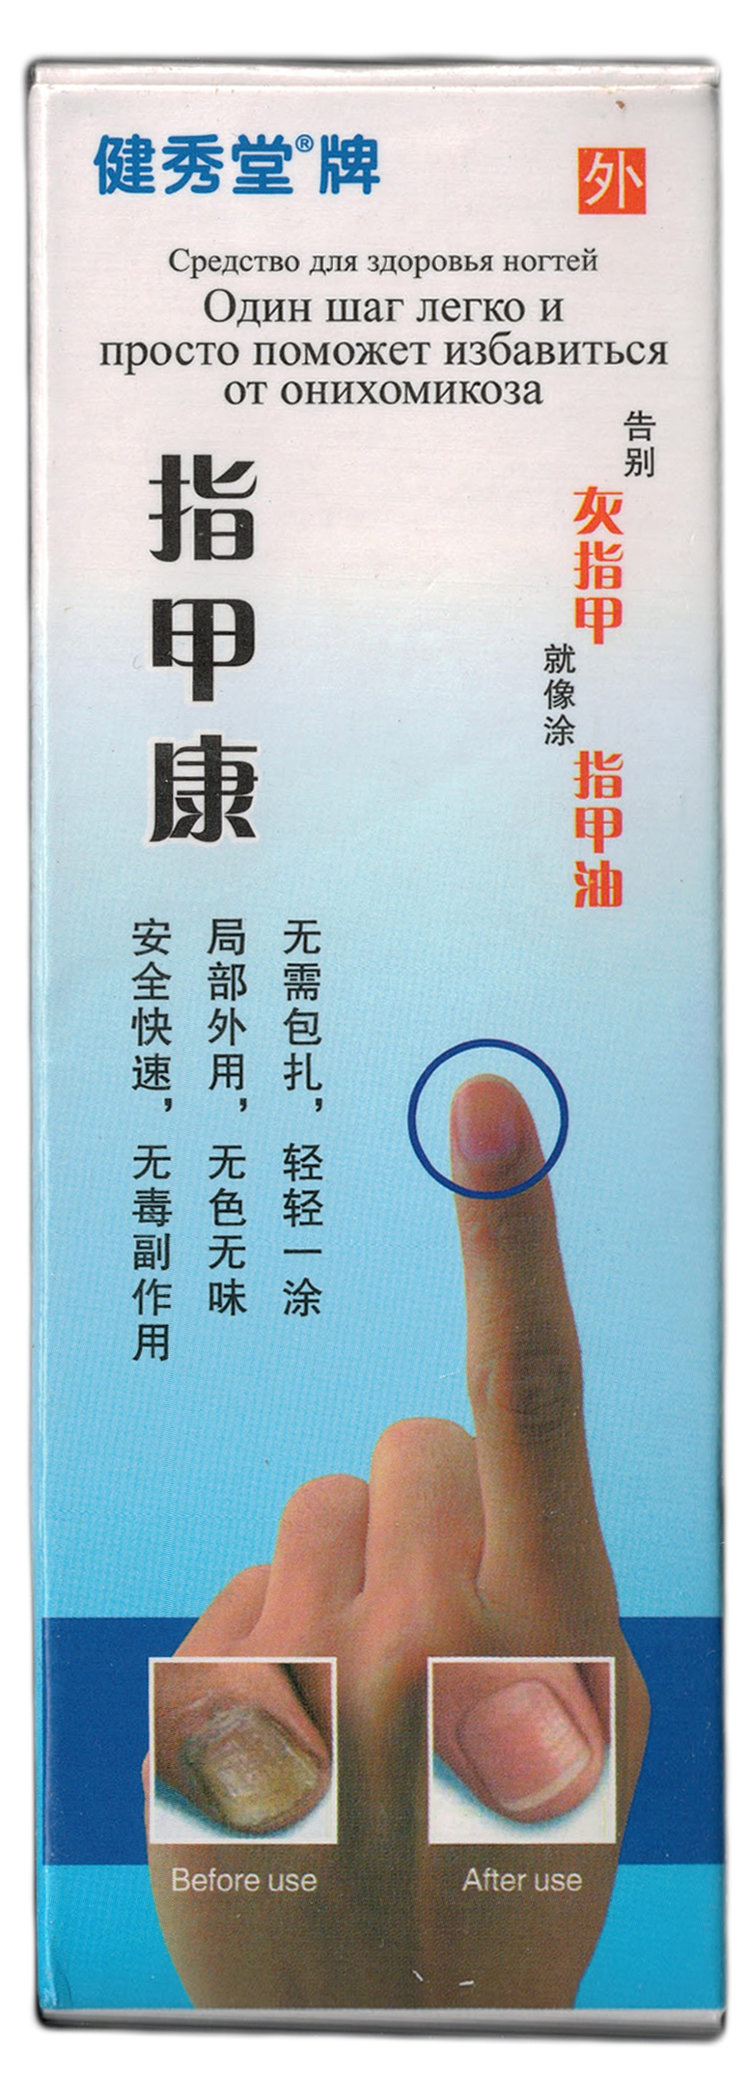 Грибок ногтей мазь китай